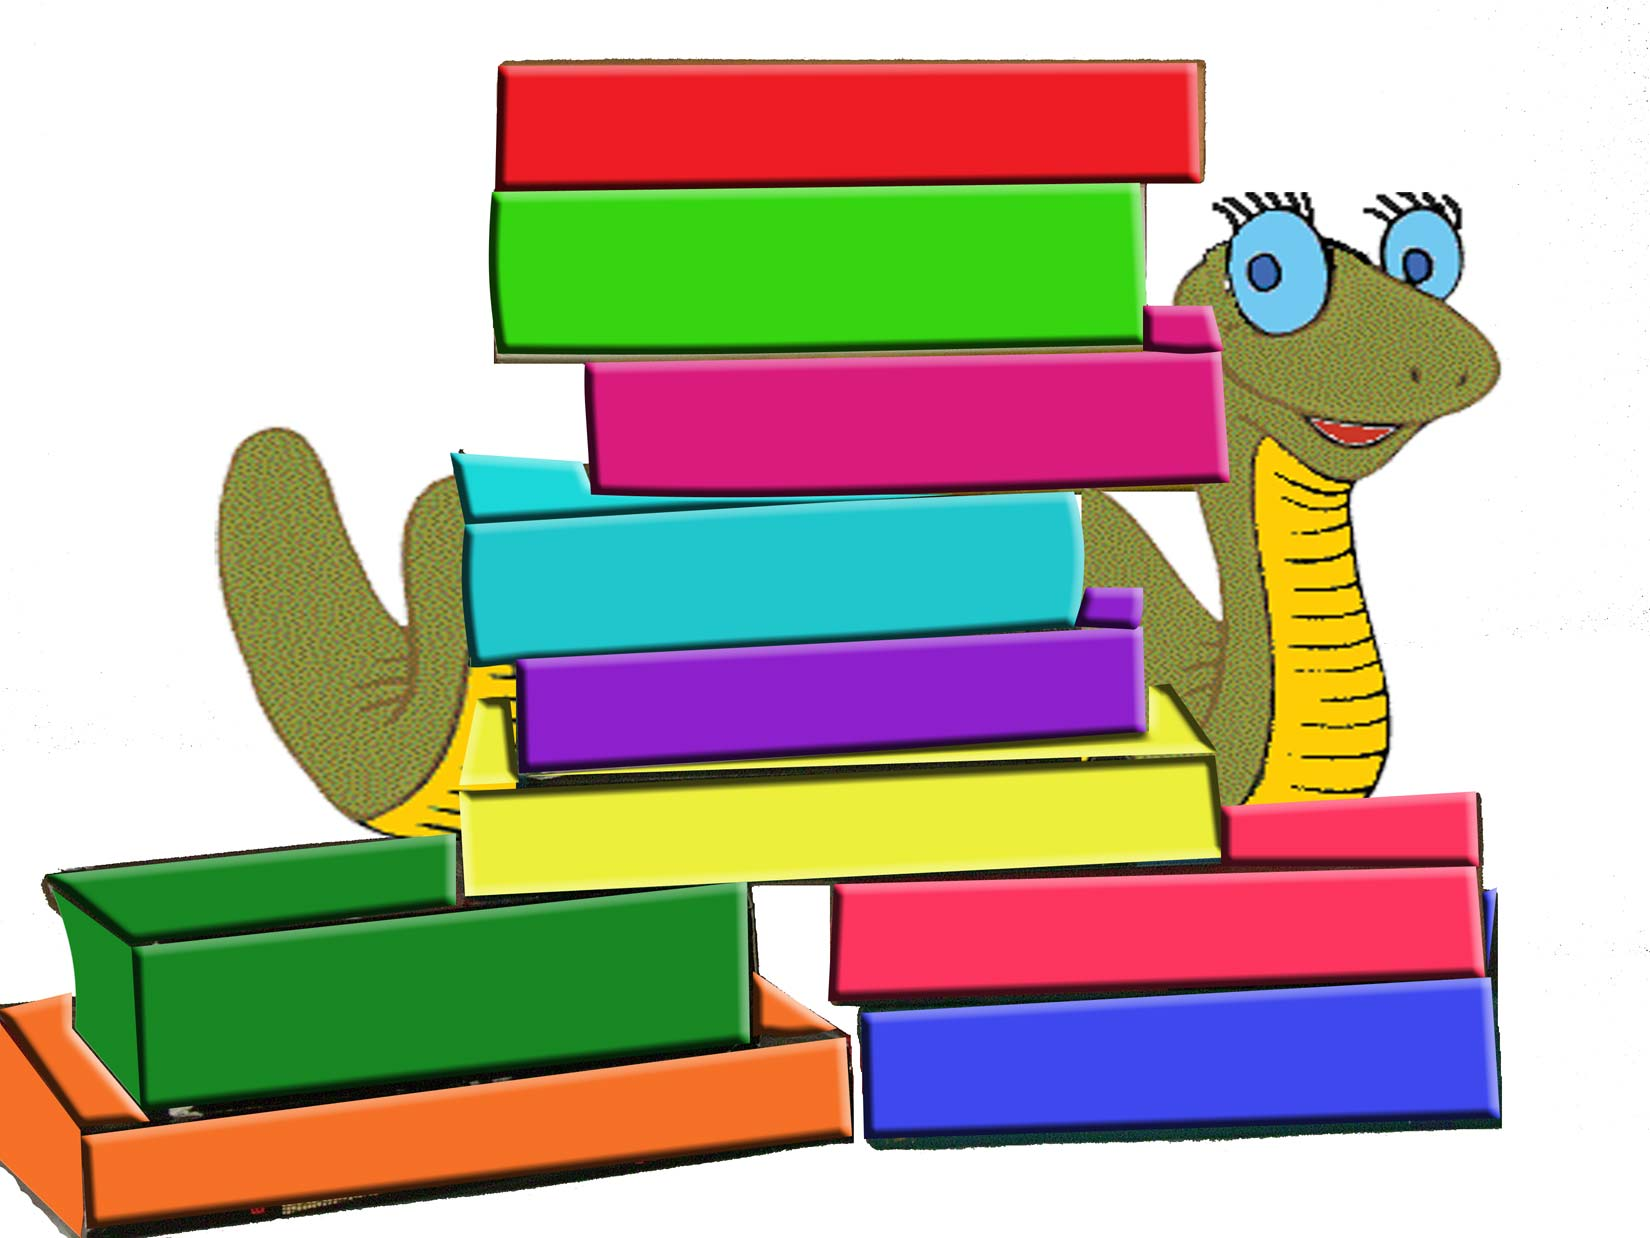 Childrenu0026#39;s Books Clipart-childrenu0026#39;s books clipart-10